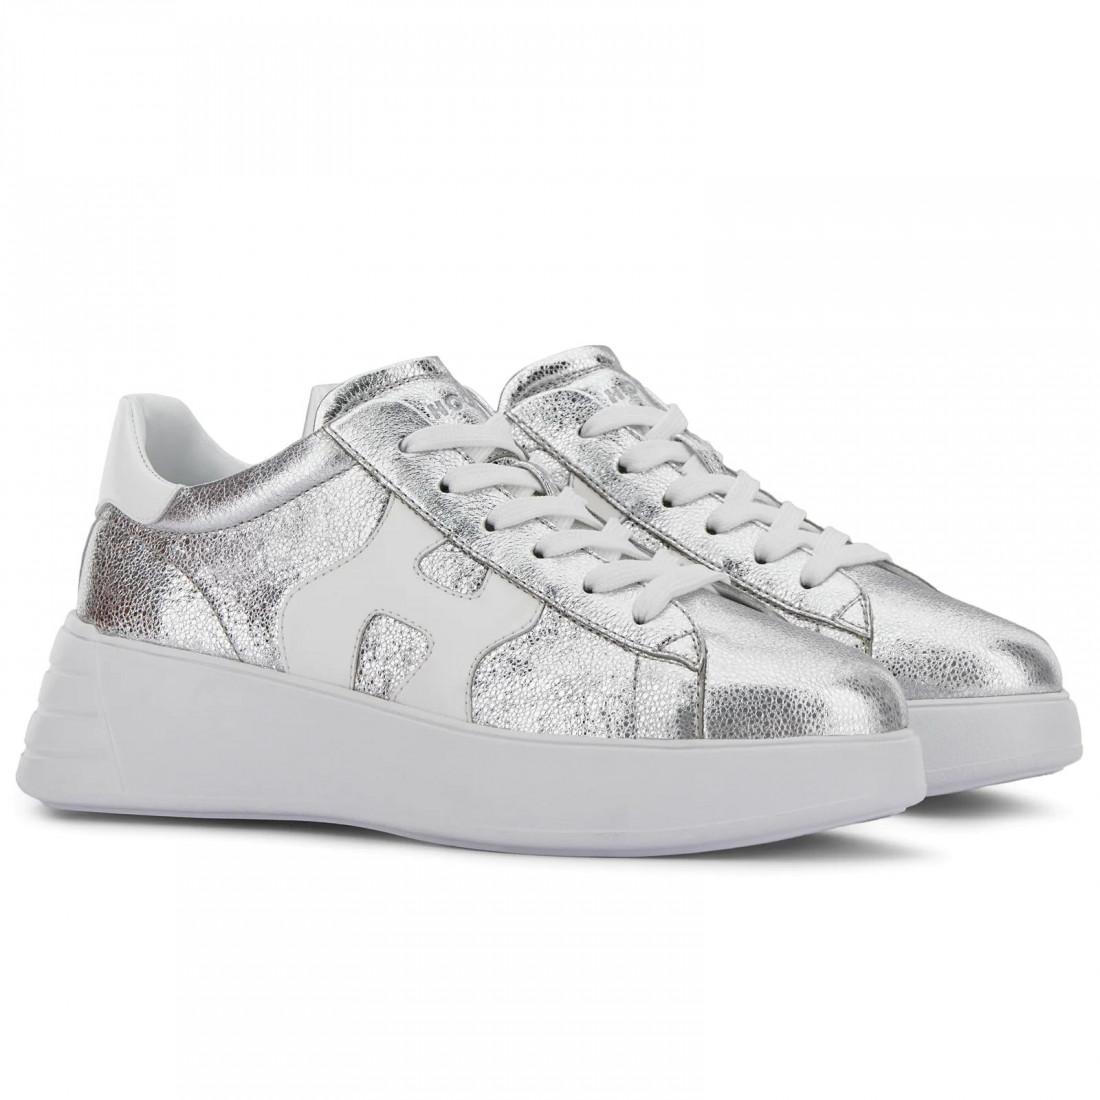 sneakers woman hogan hxw5620dn61q8t0906 8868